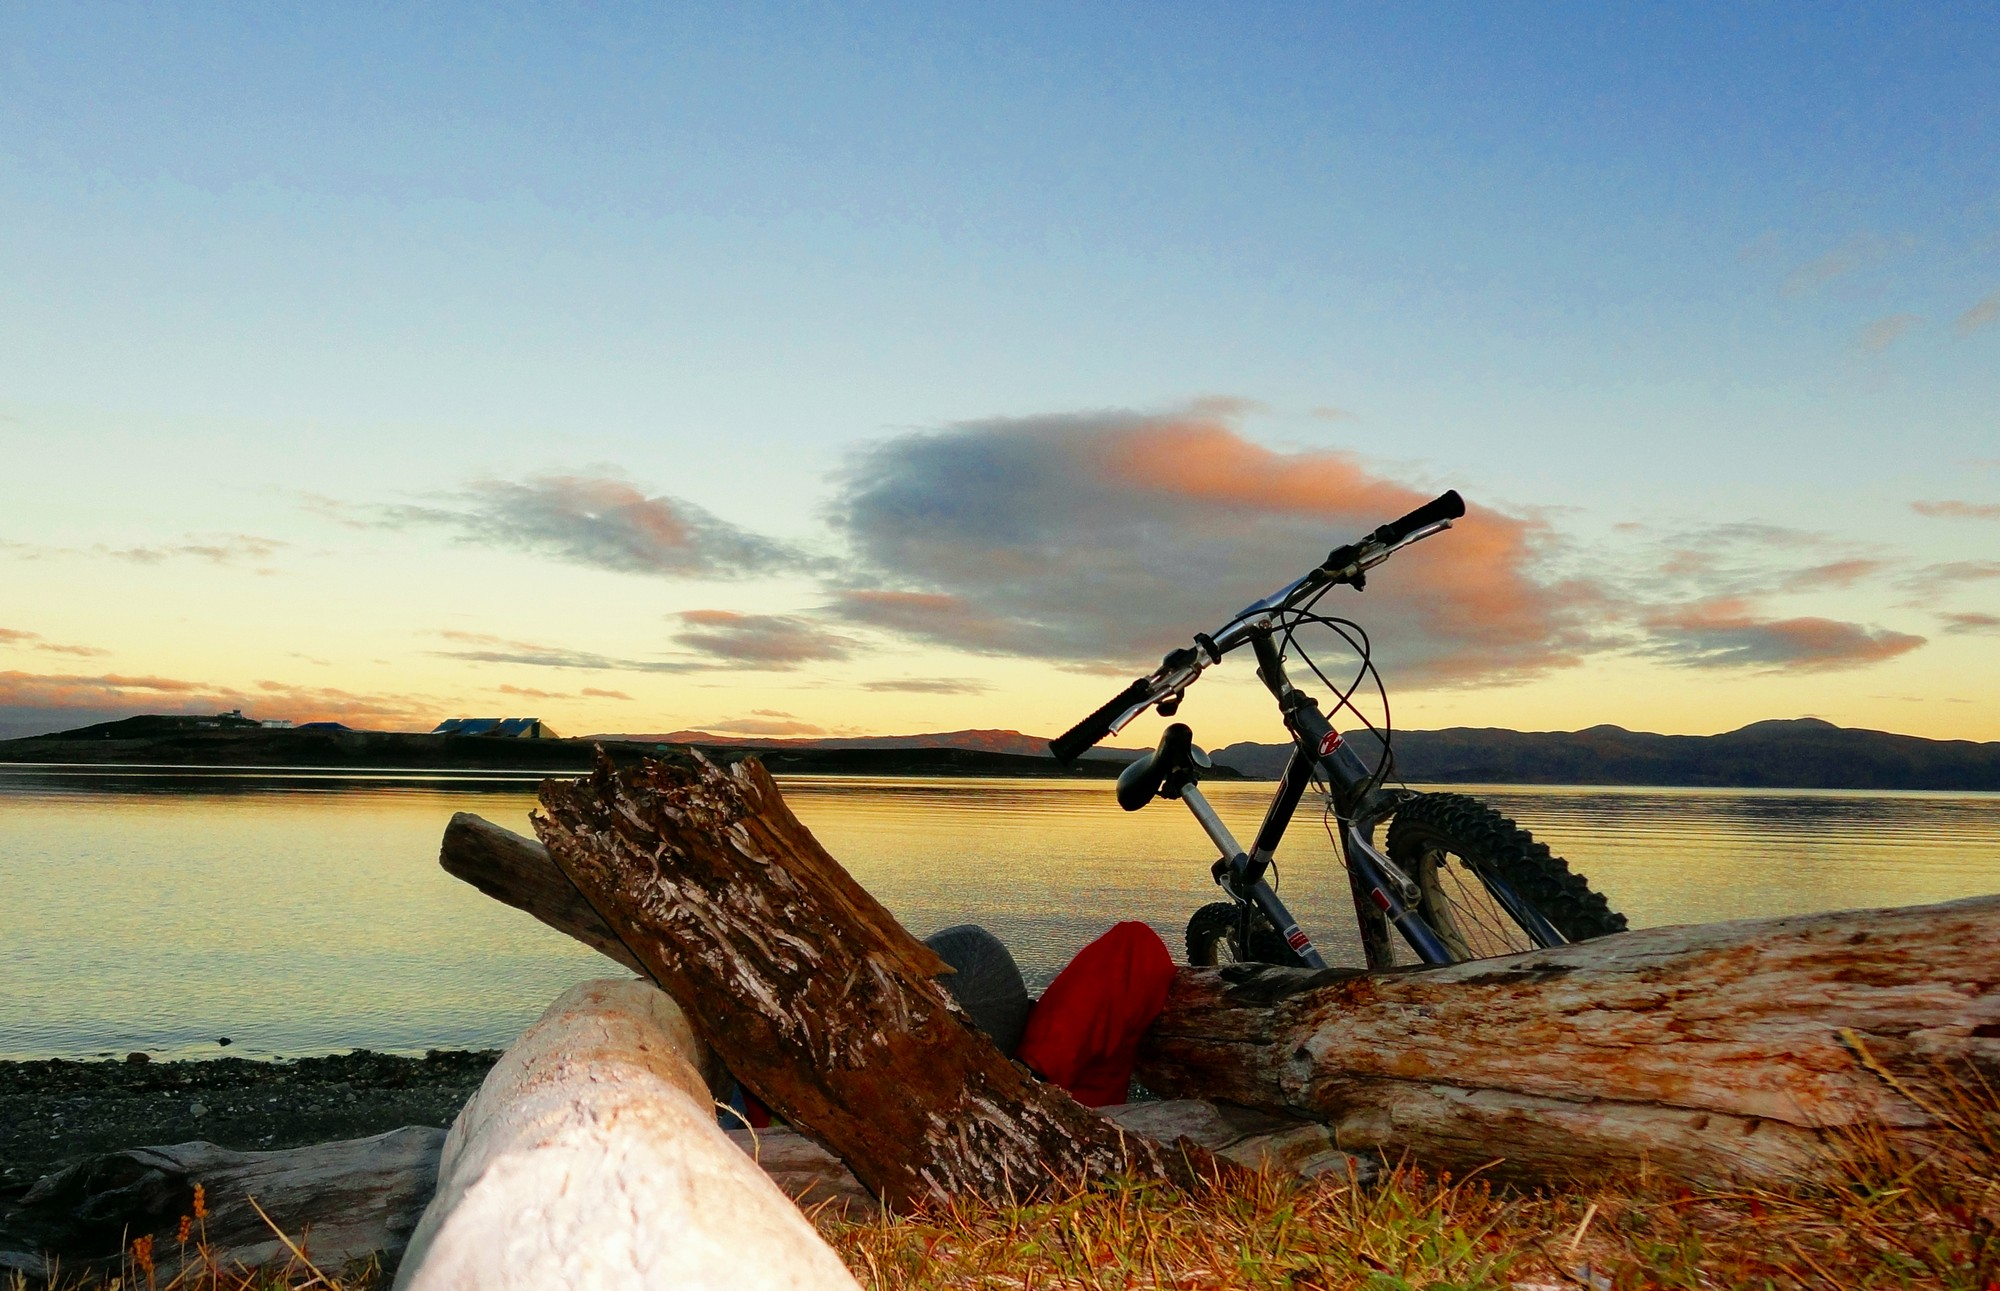 Biking-Matias-Derisio-2k